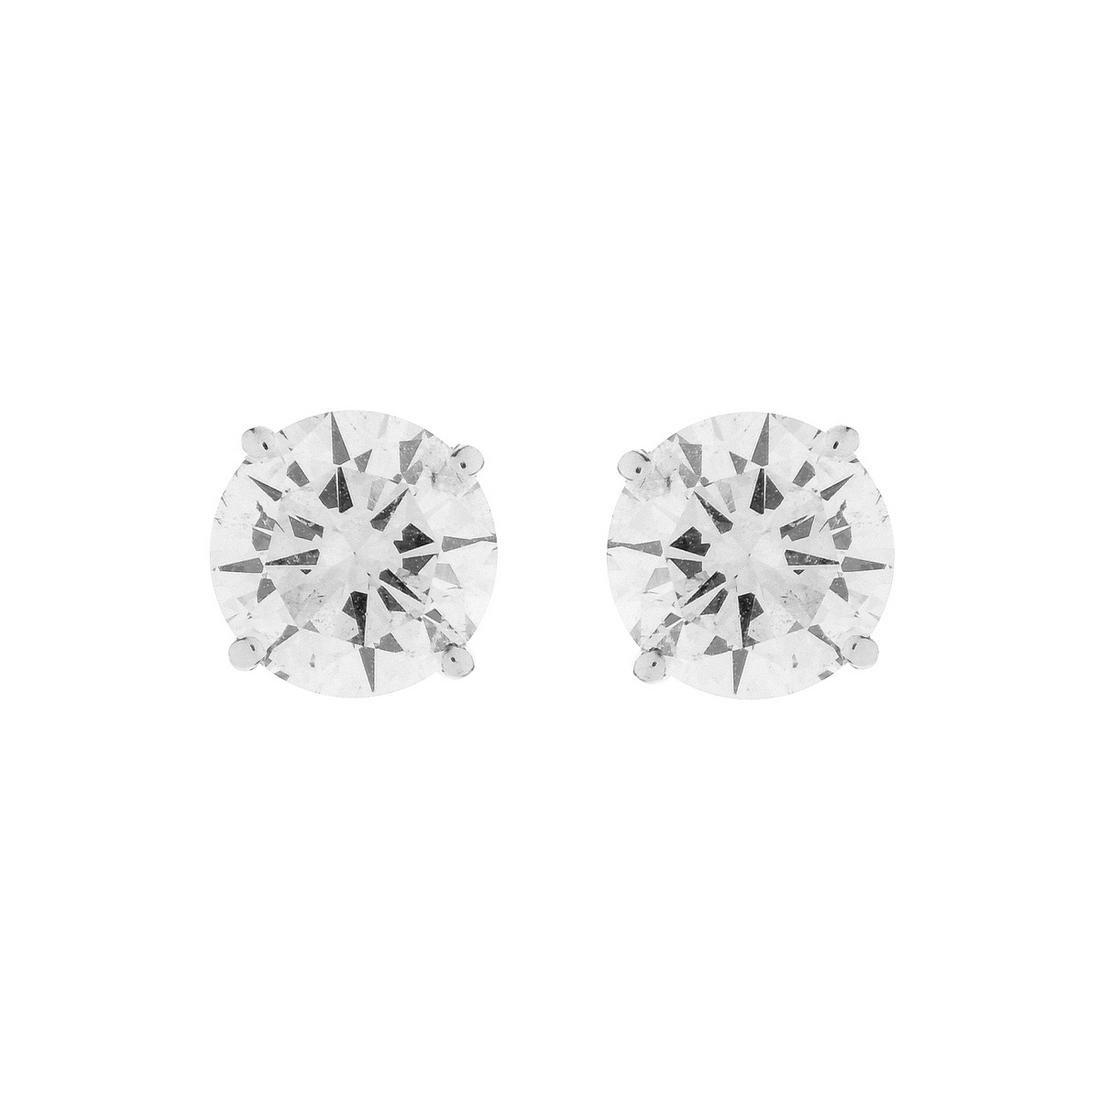 4.0ct TW Diamond and 14K Stud Earrings